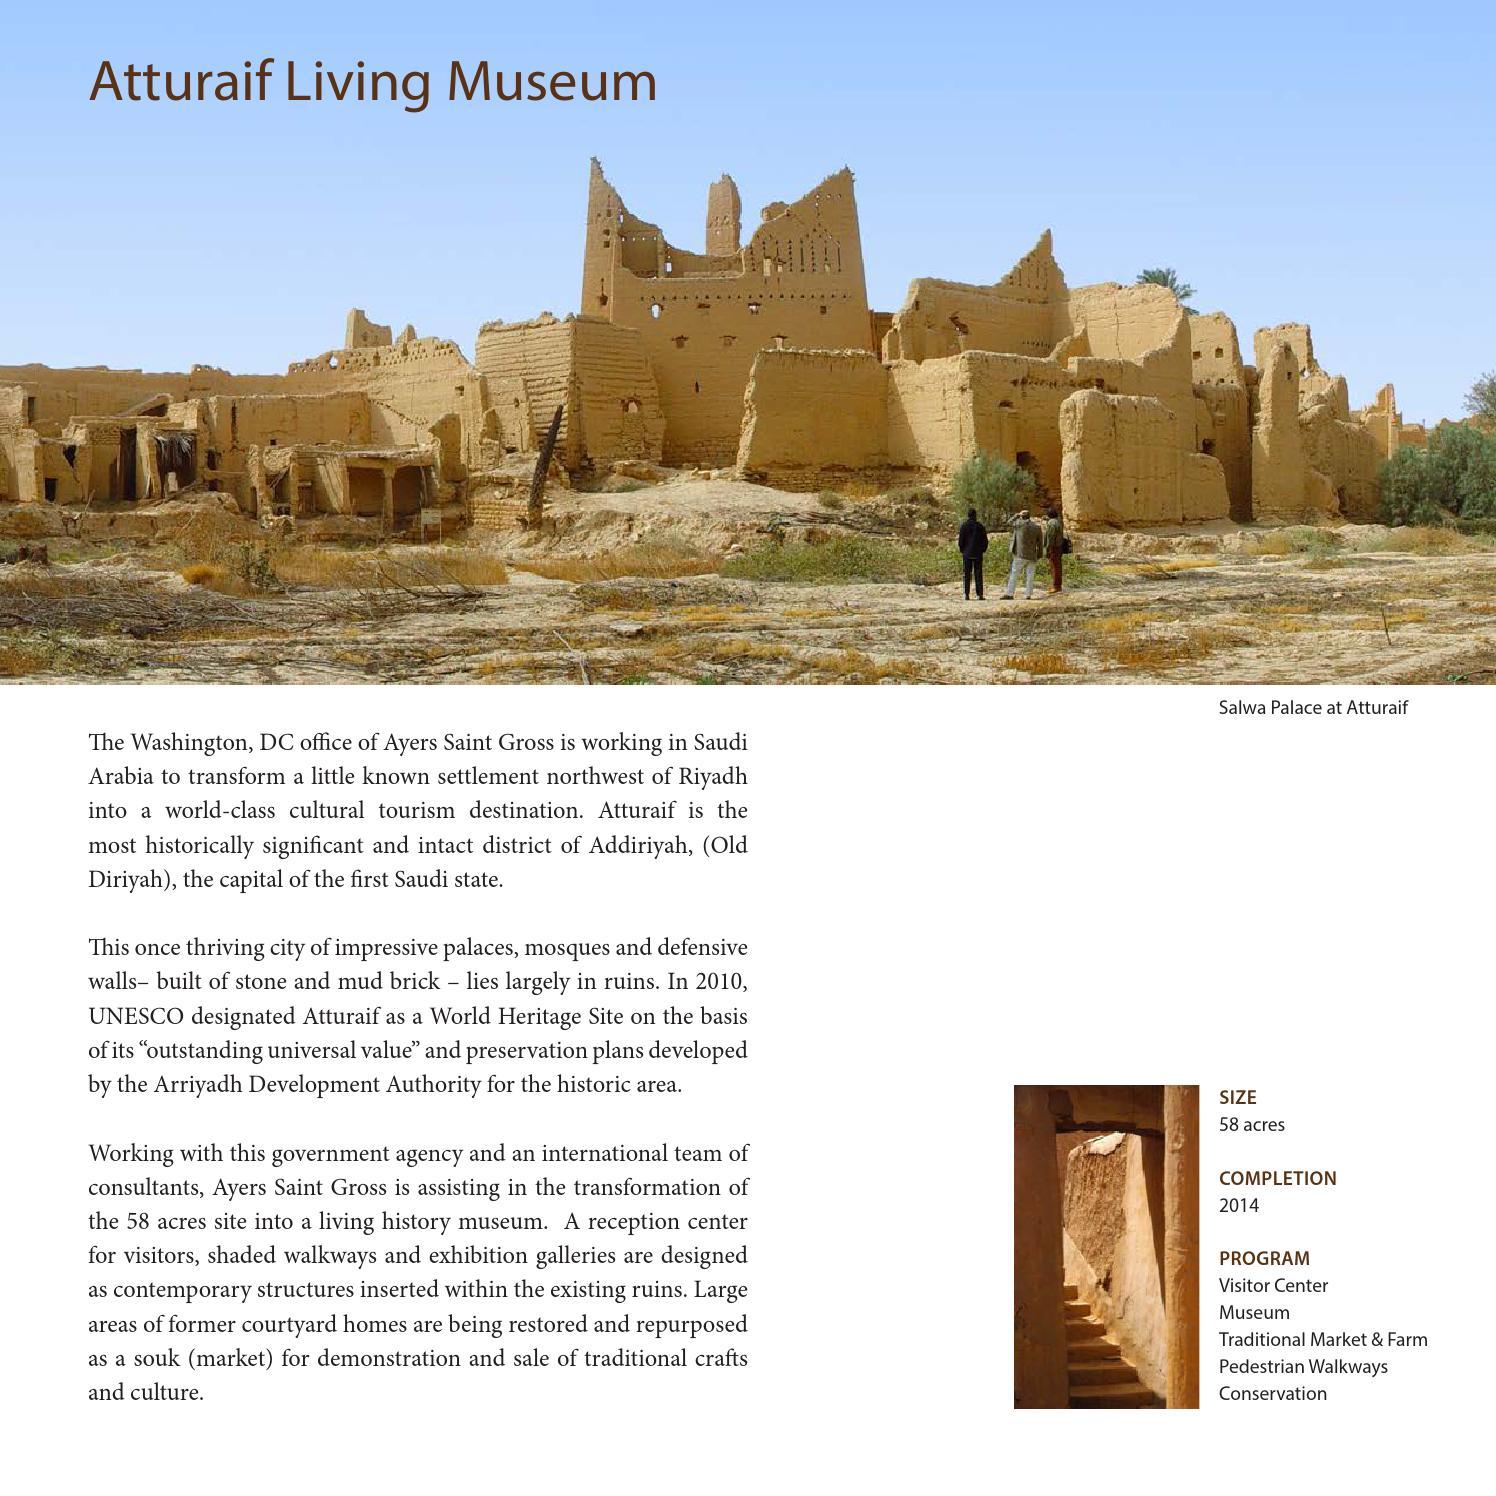 Atturaif Living Museum, Riyadh, Kingdom of Saudi Arabia by Ayers